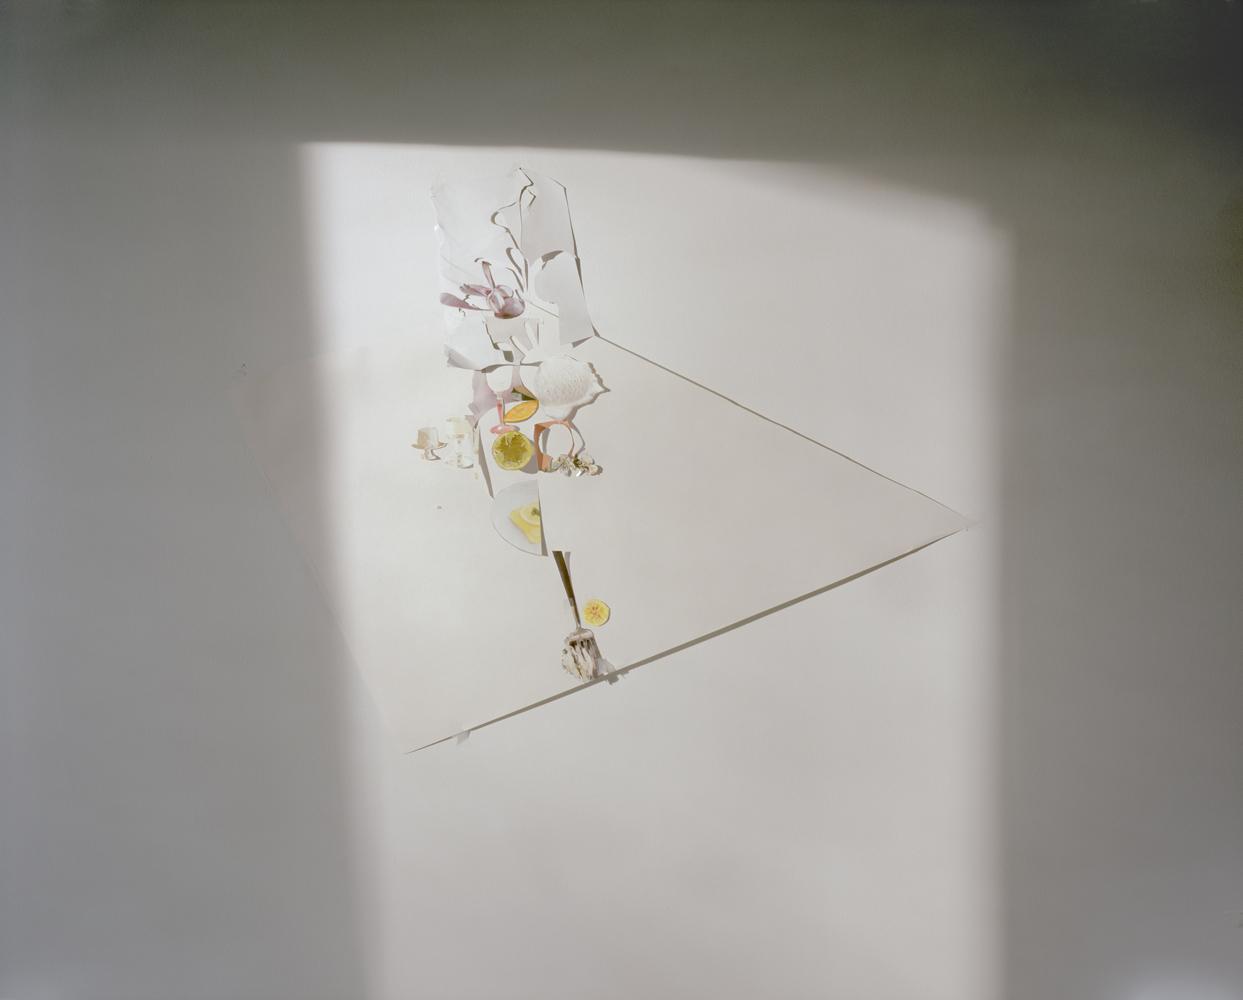 Untitled #13, 2011